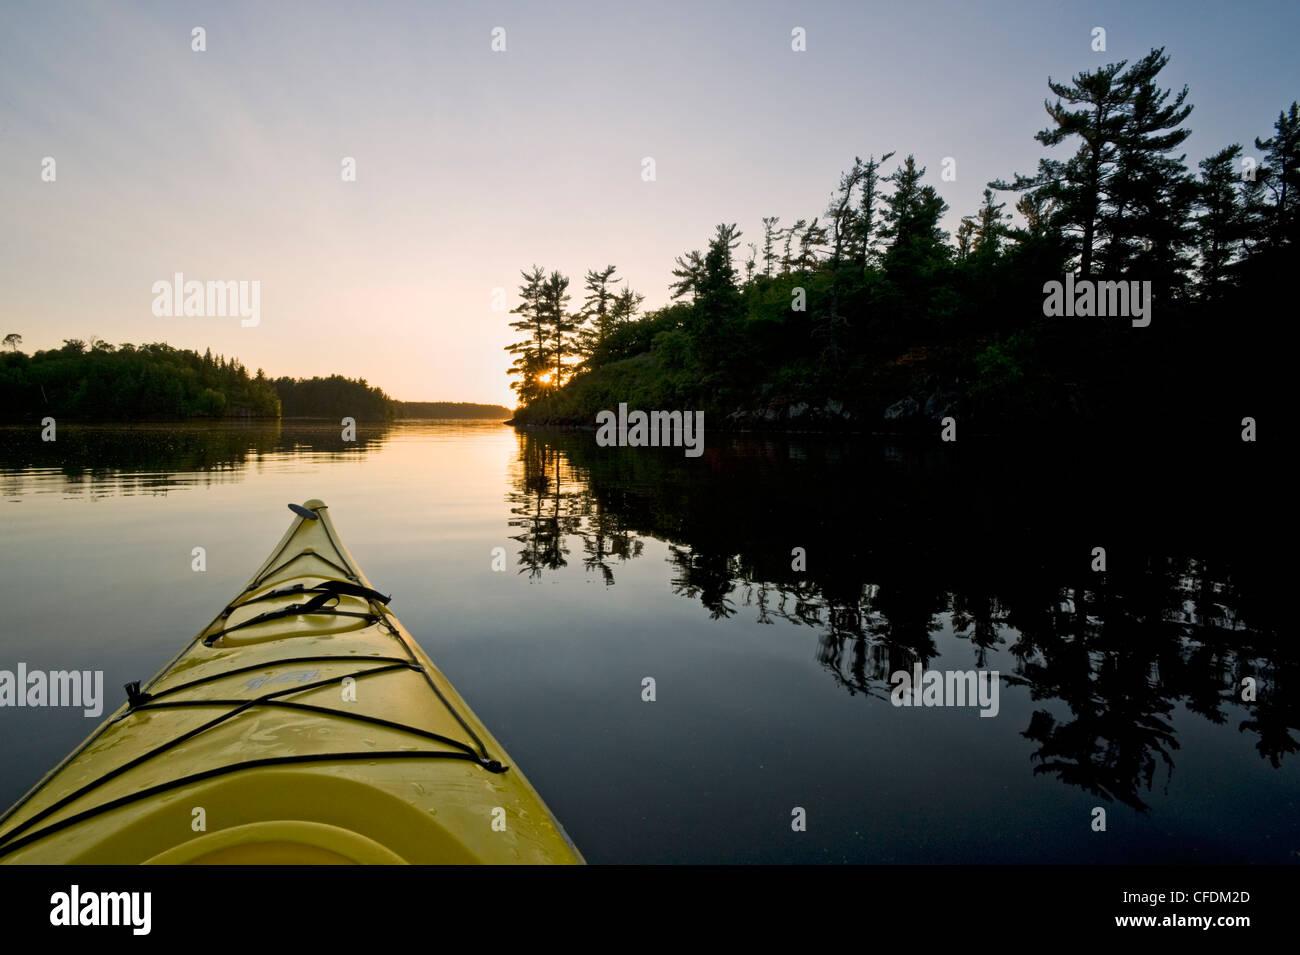 Kayak on Lake of the Woods, Northwestern Ontario, Canada - Stock Image